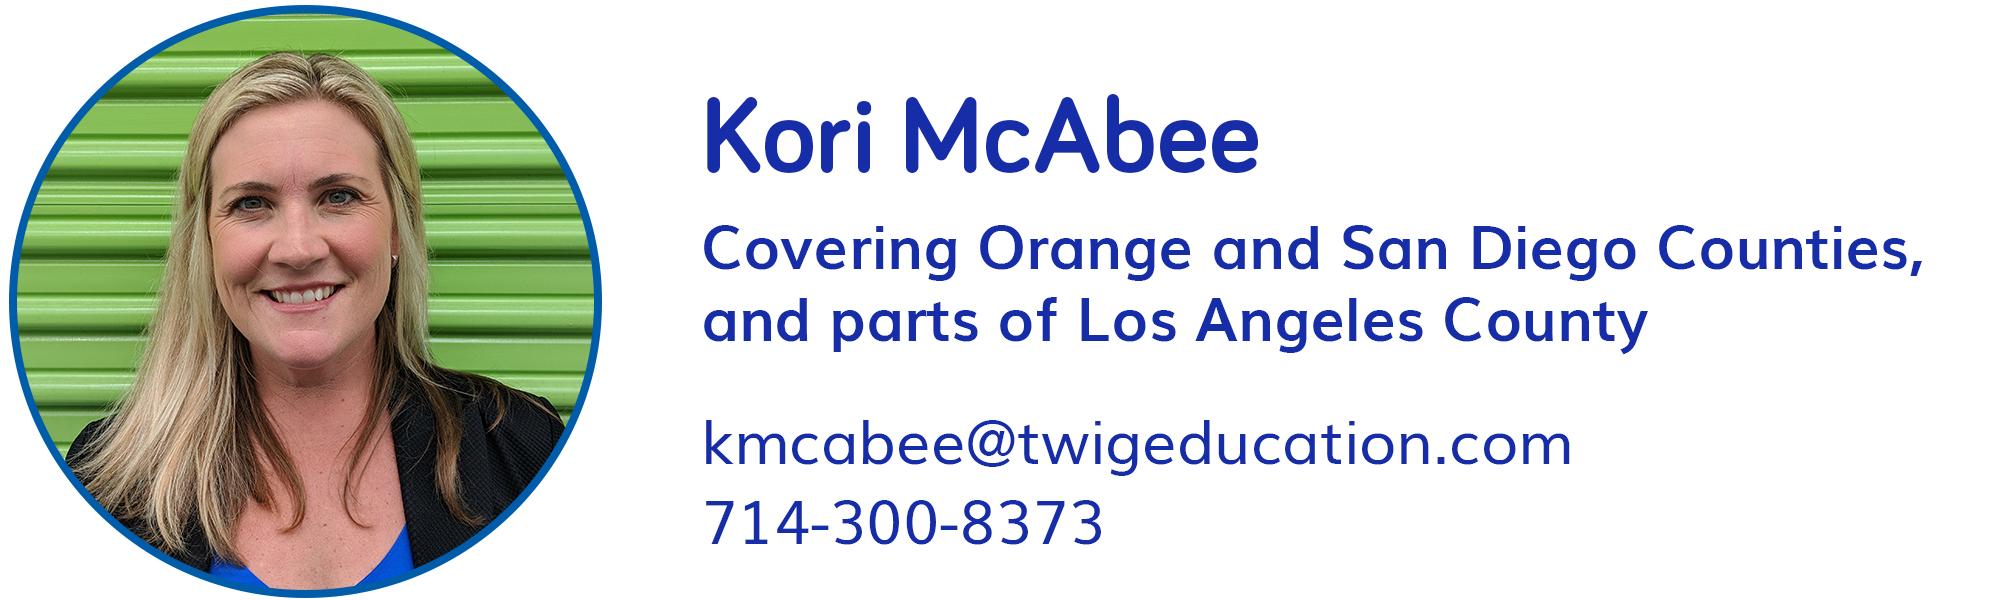 Kori McAbee, kmcabee@twigeducation.com, 714-300-8373